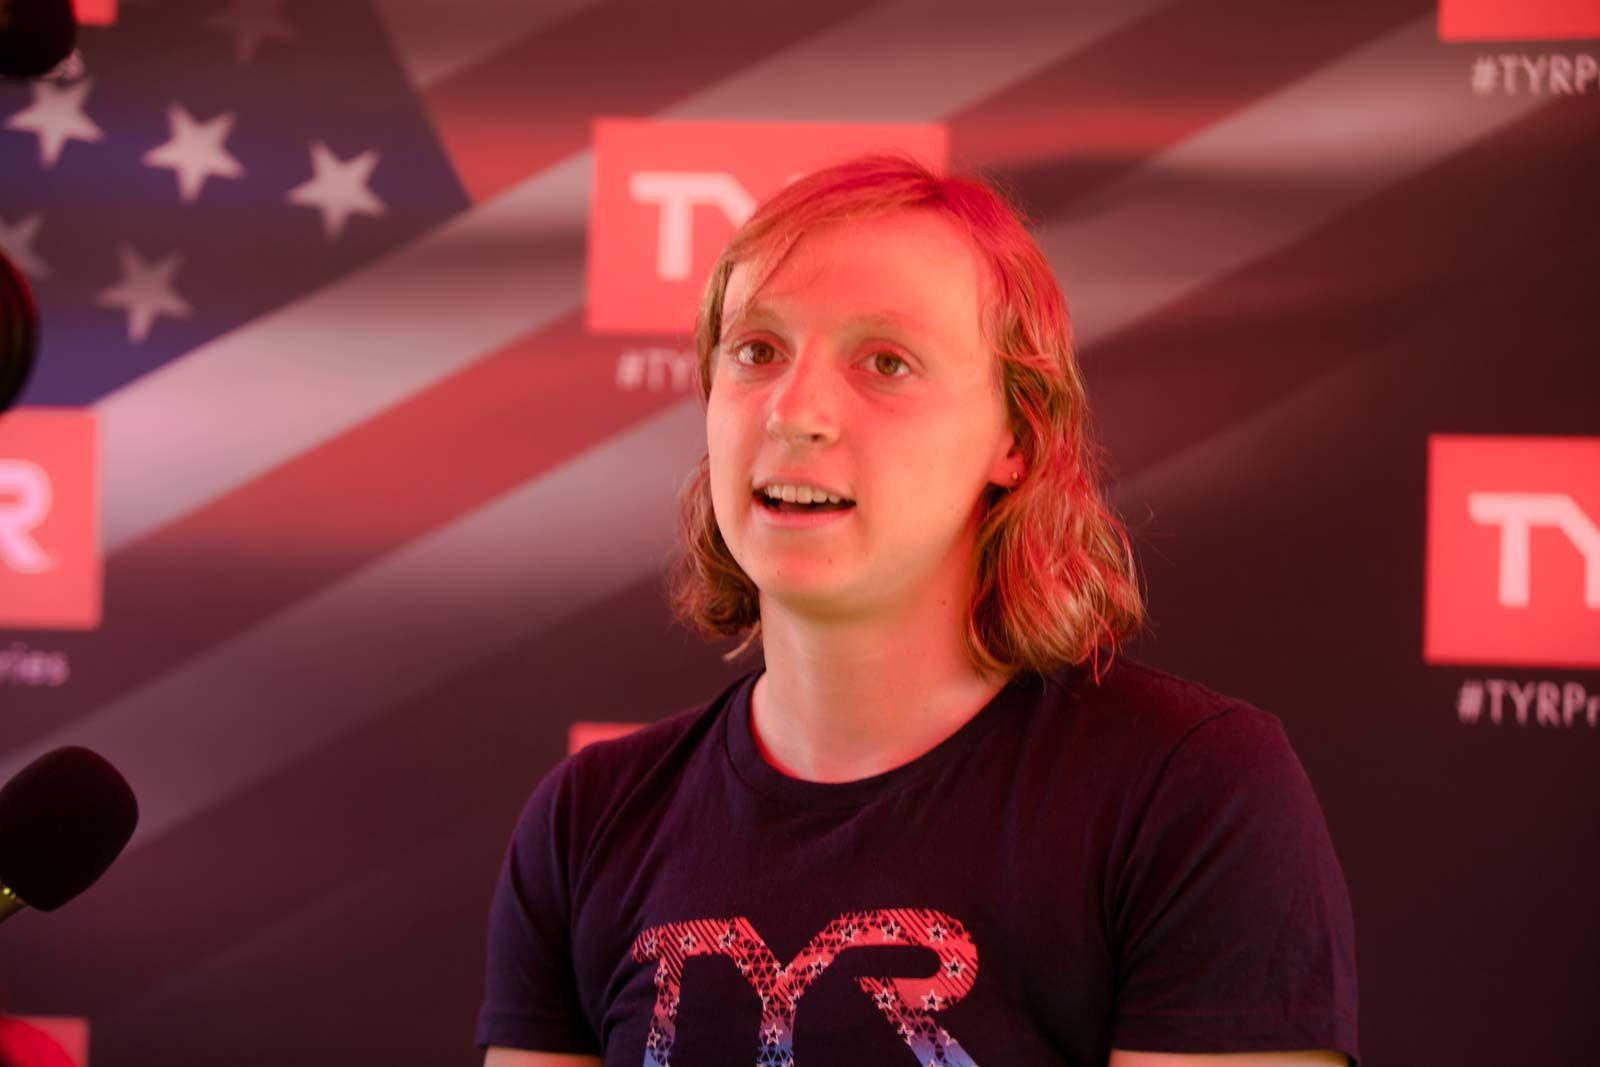 Katie Ledecky professional swimmer TYR